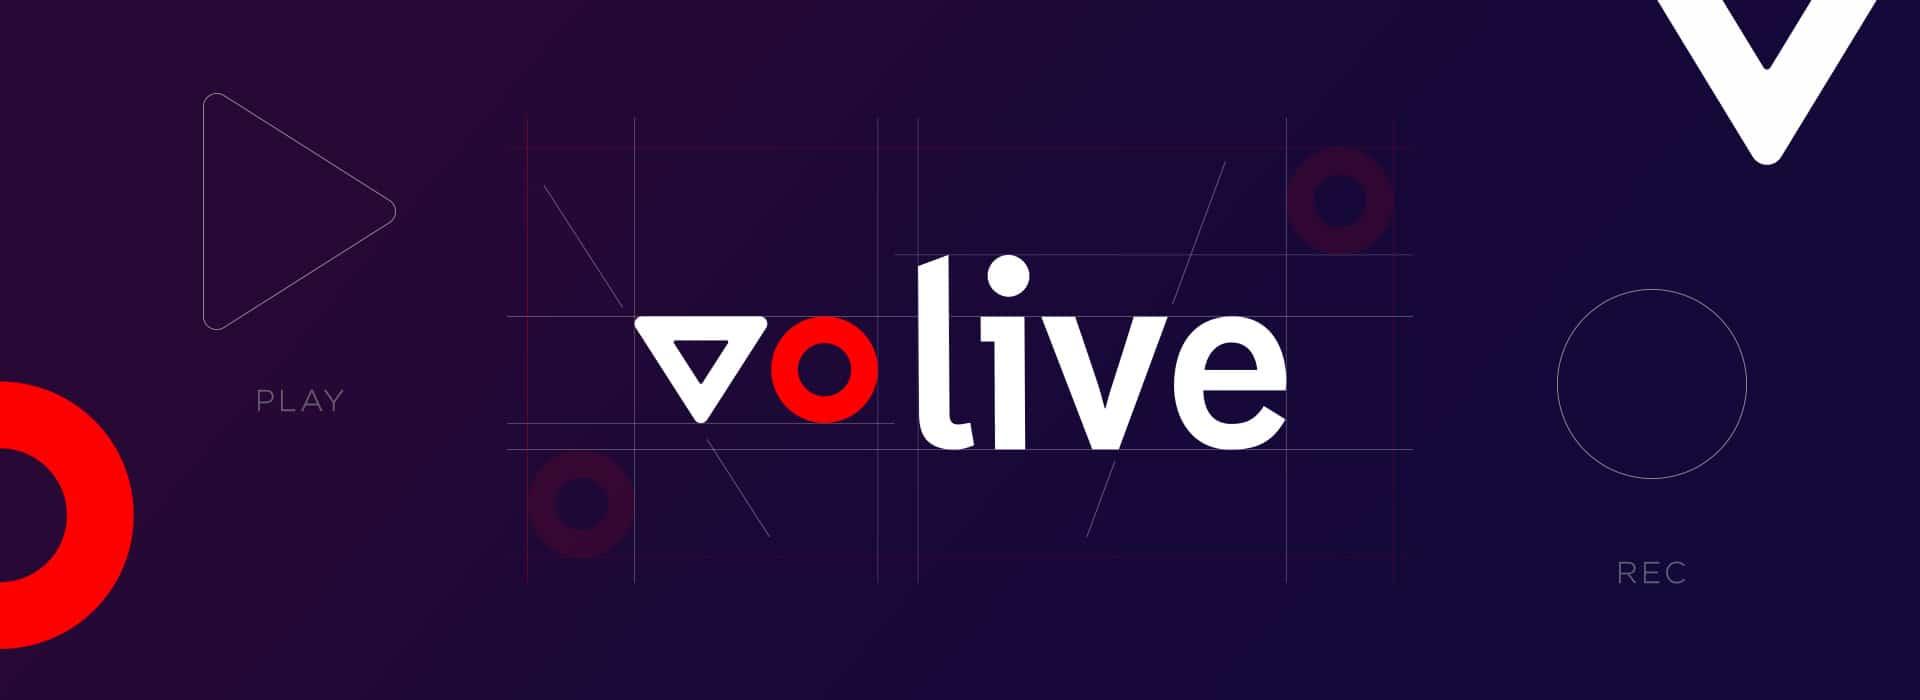 Explications de la conception du logo de VO Live